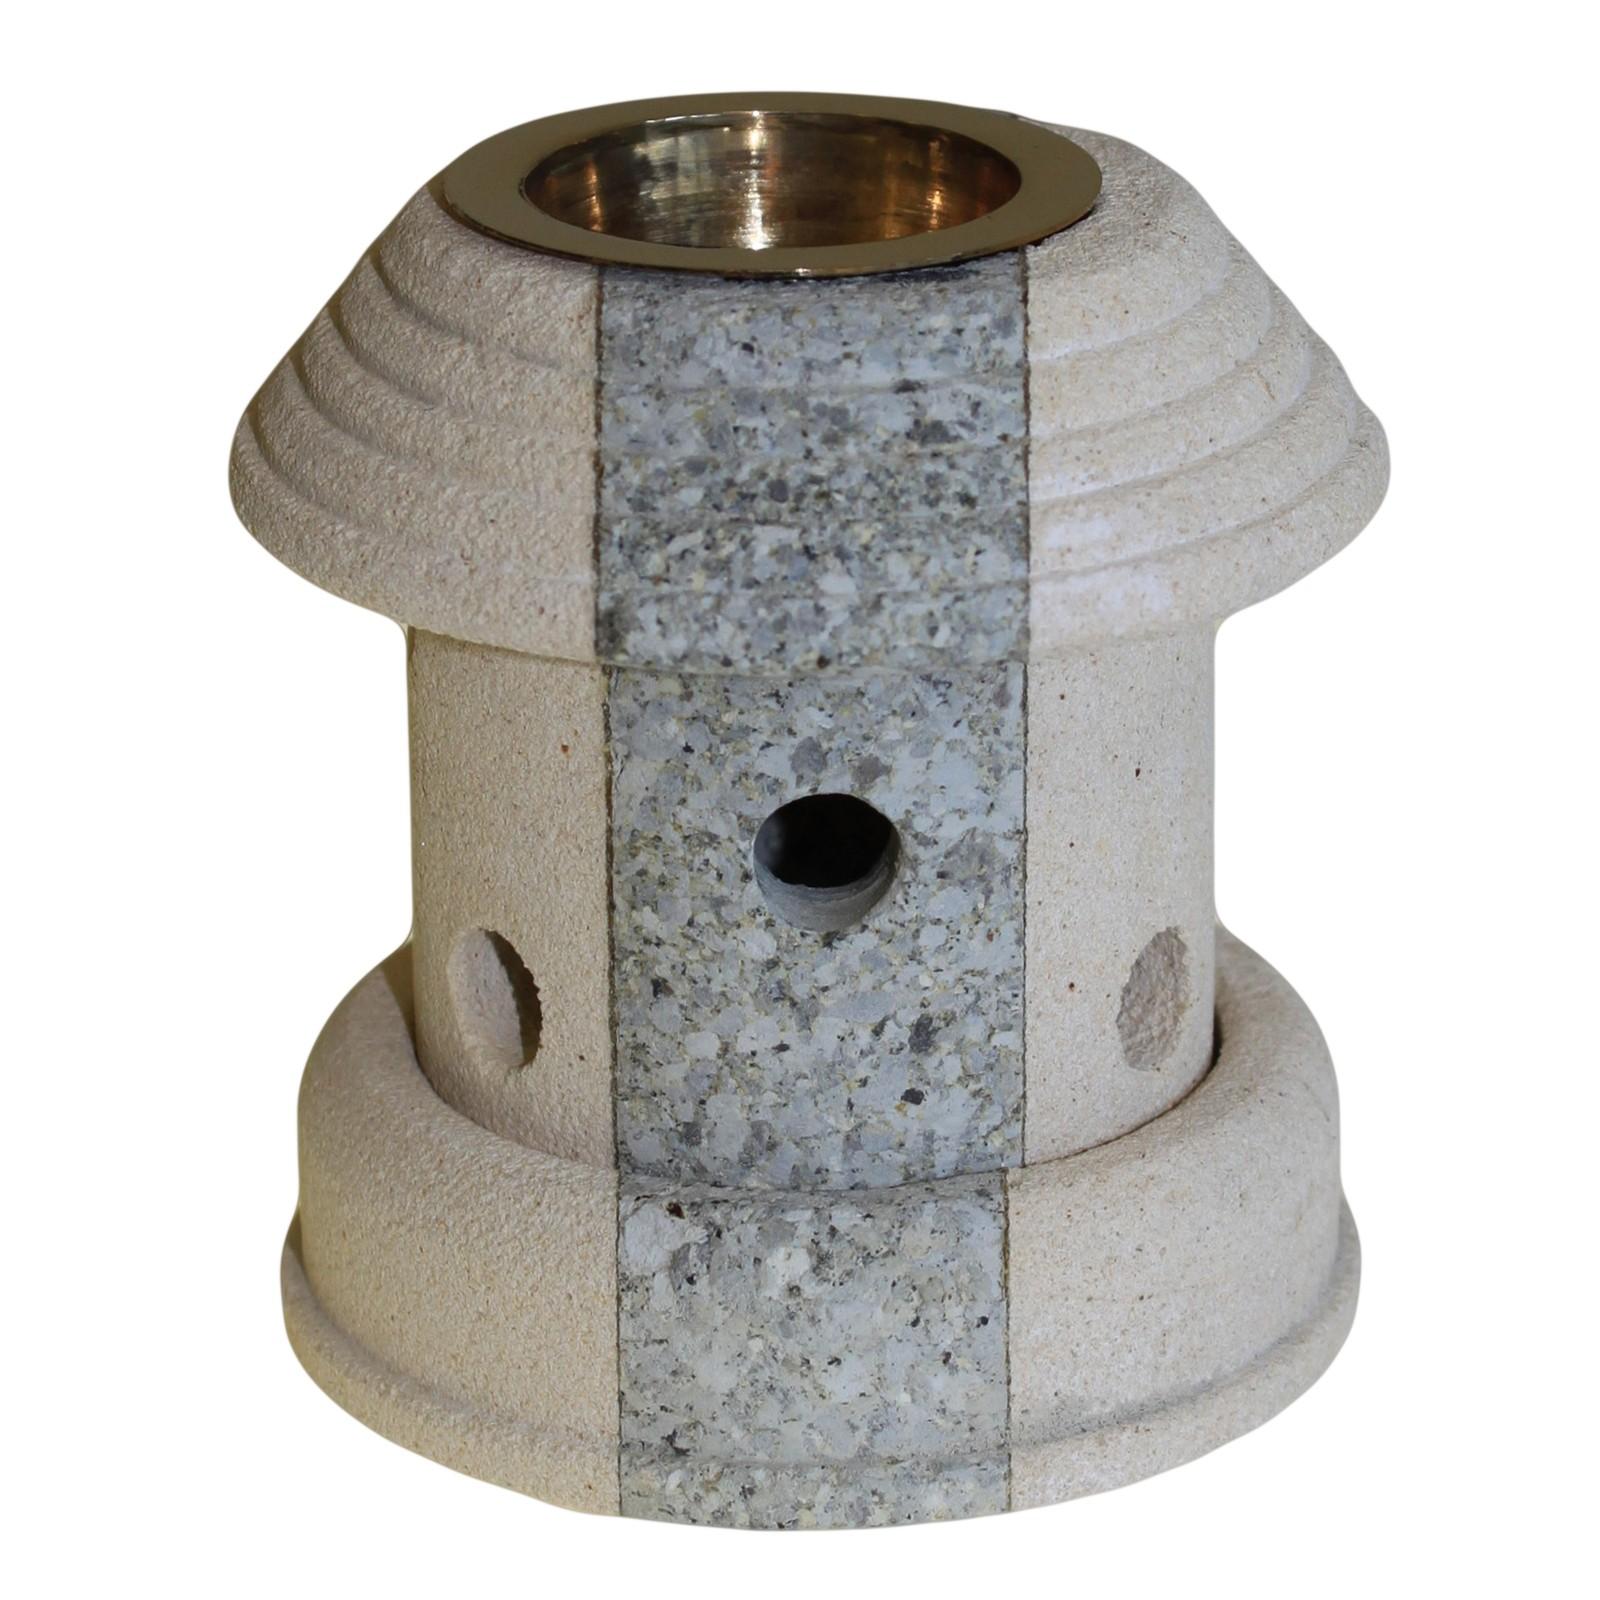 Stone Oil Burner Combo Lantern